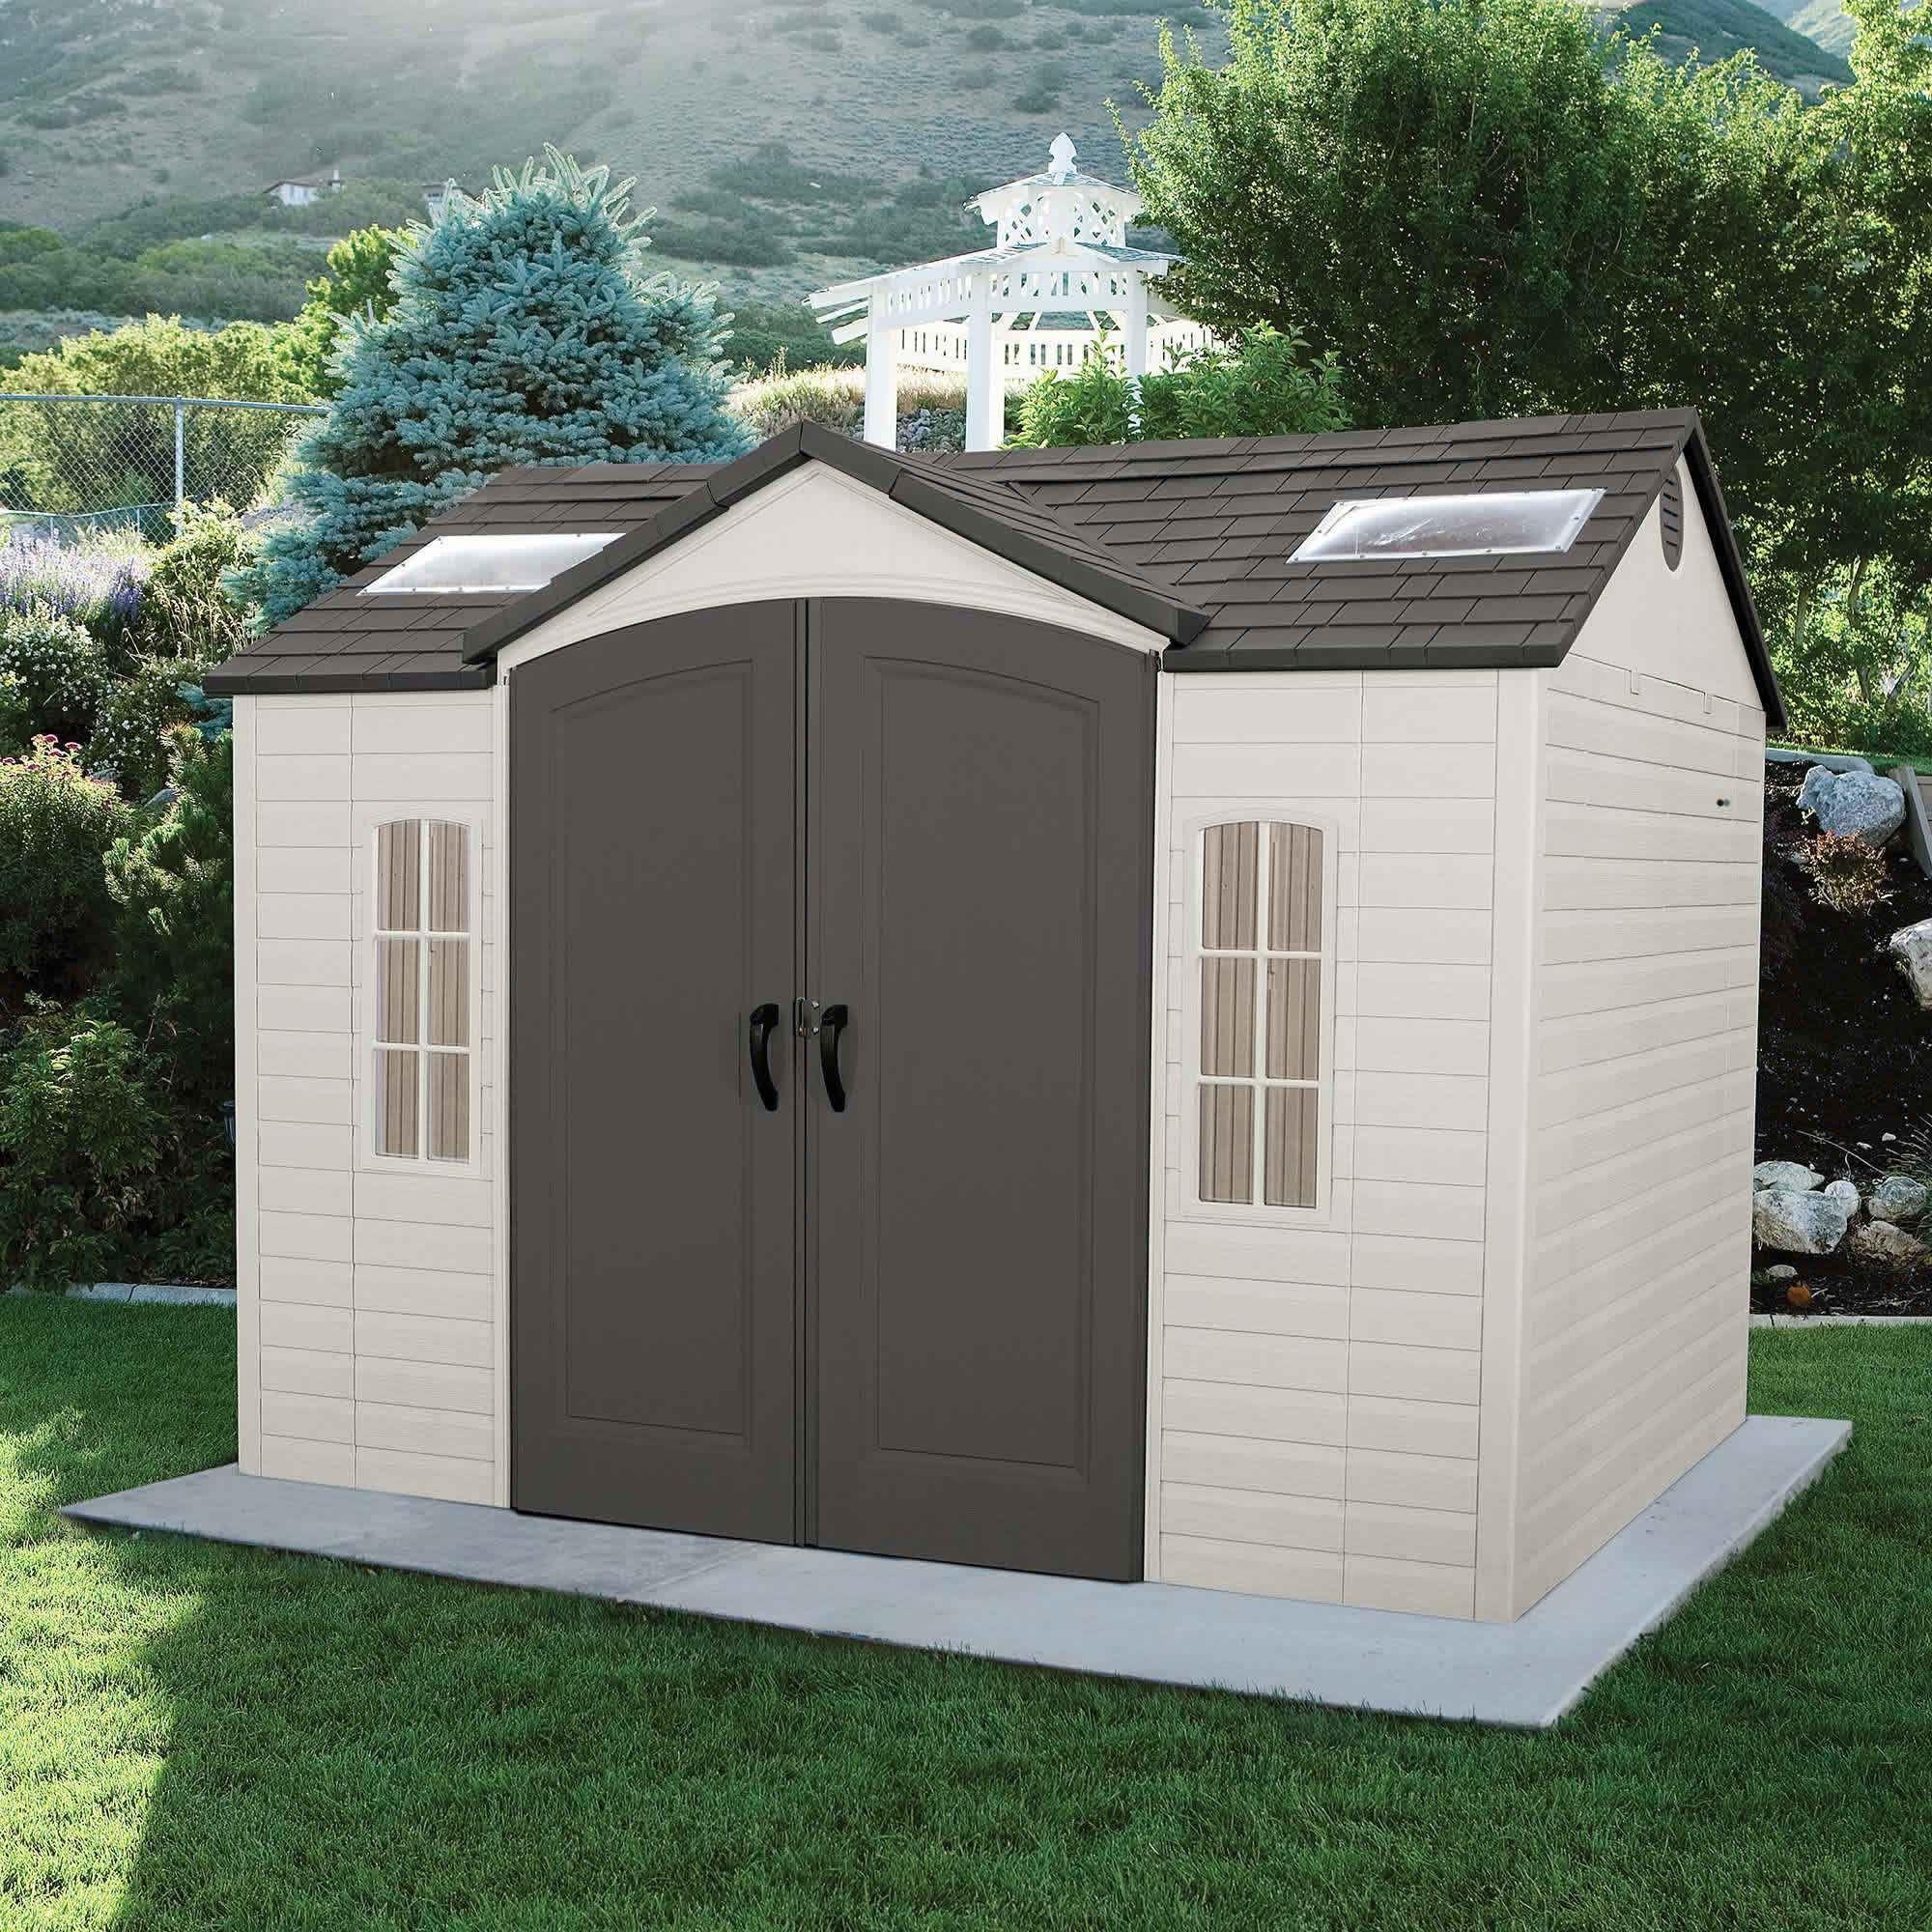 Lifetime 10x8 Ft Garden Storage Shed Kit W Floor 60005 Garden Storage Shed Outdoor Sheds Building A Shed